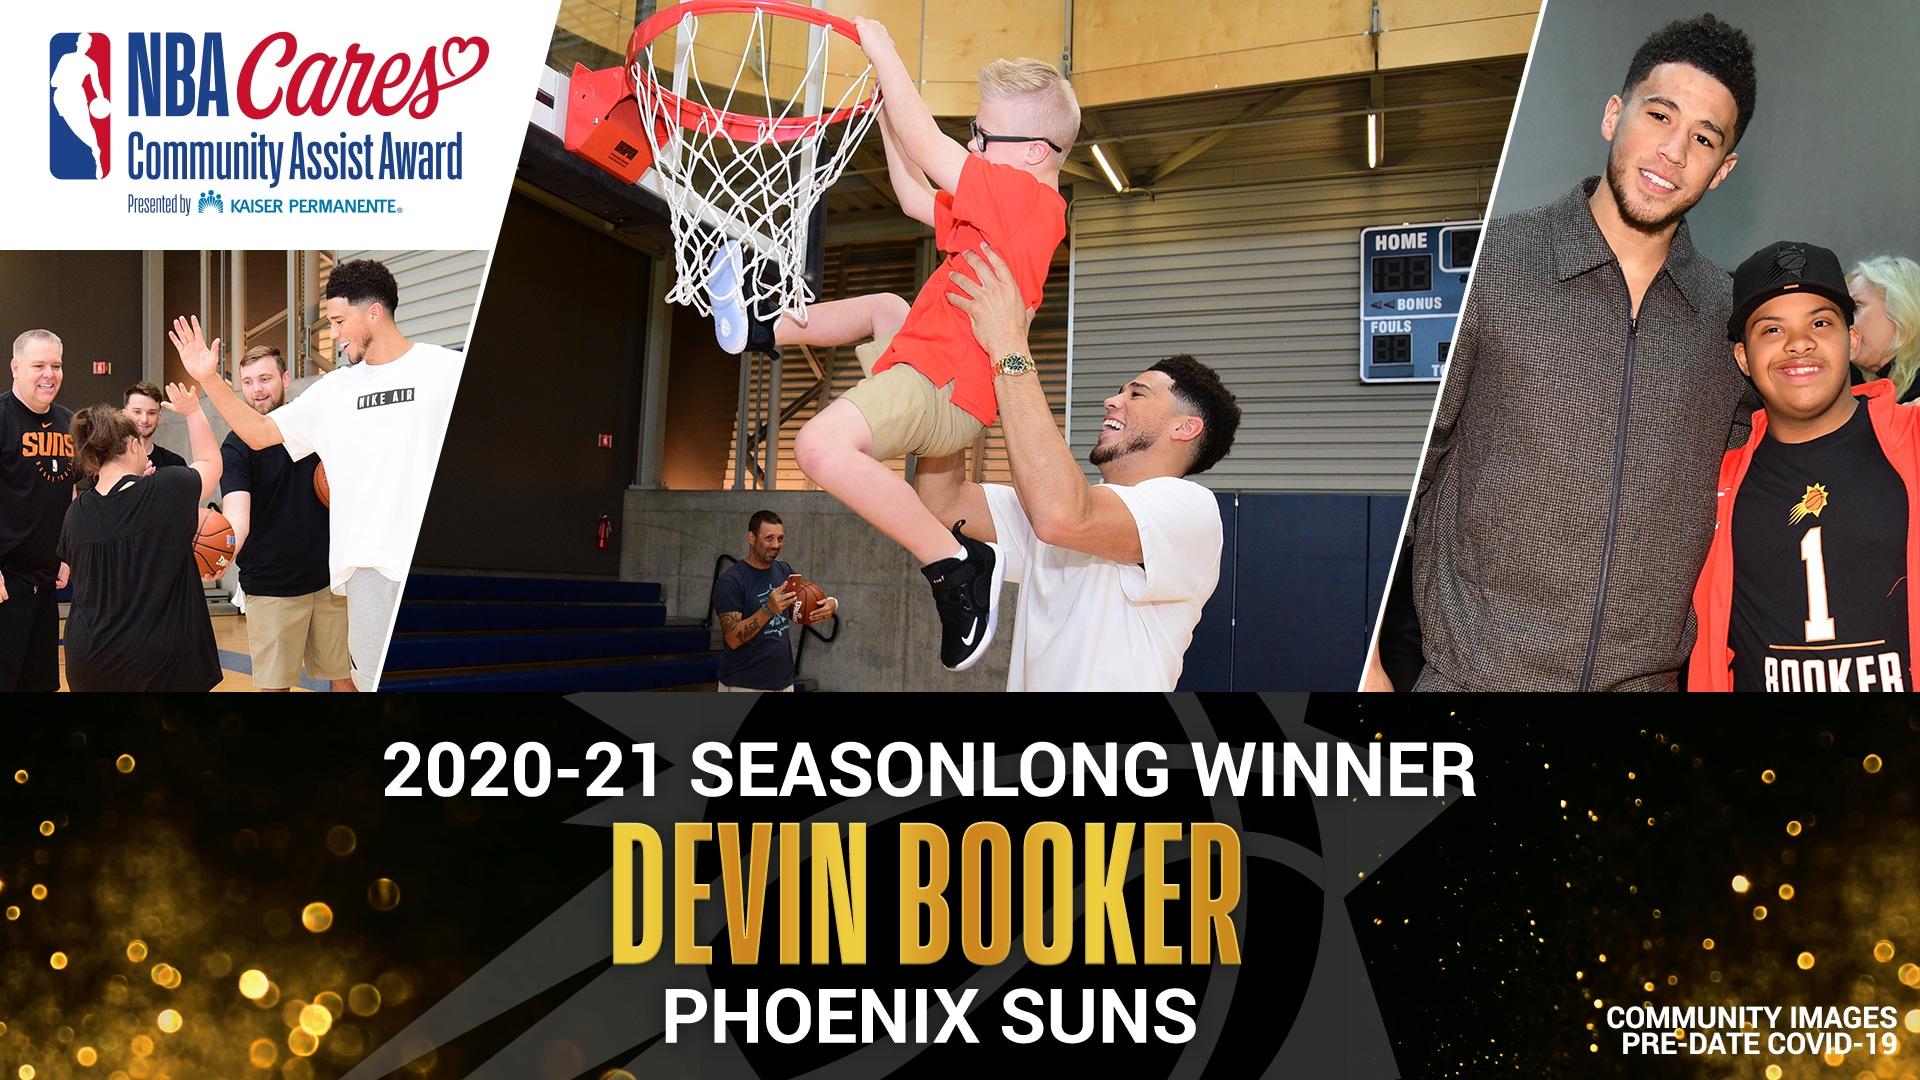 Devin Booker named Seasonlong NBA Cares Community Assist Award winner